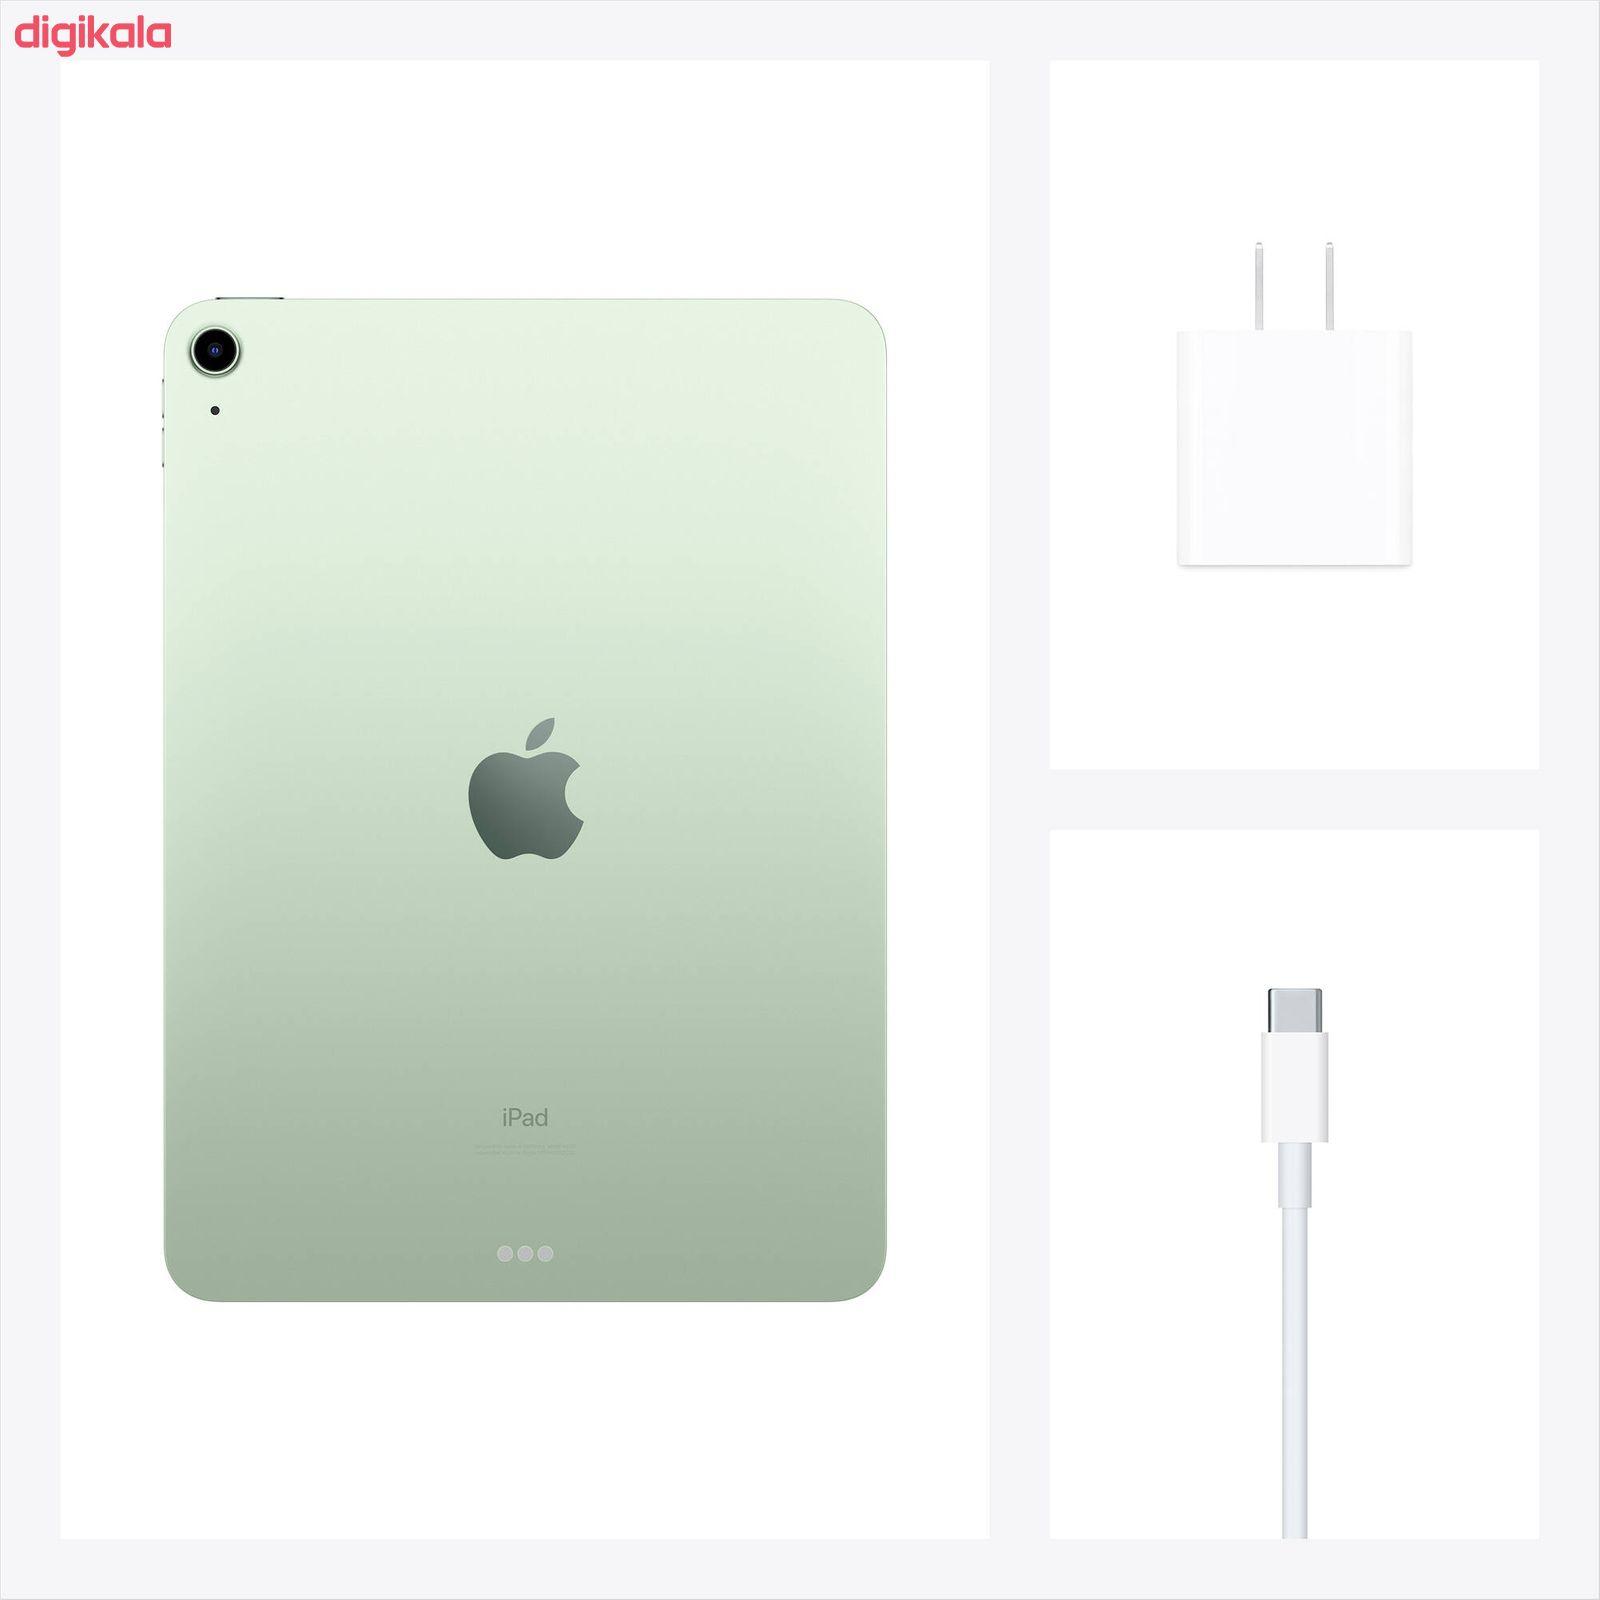 تبلت اپل مدل iPad Air 10.9 inch 2020 WiFi ظرفیت 64 گیگابایت  main 1 9